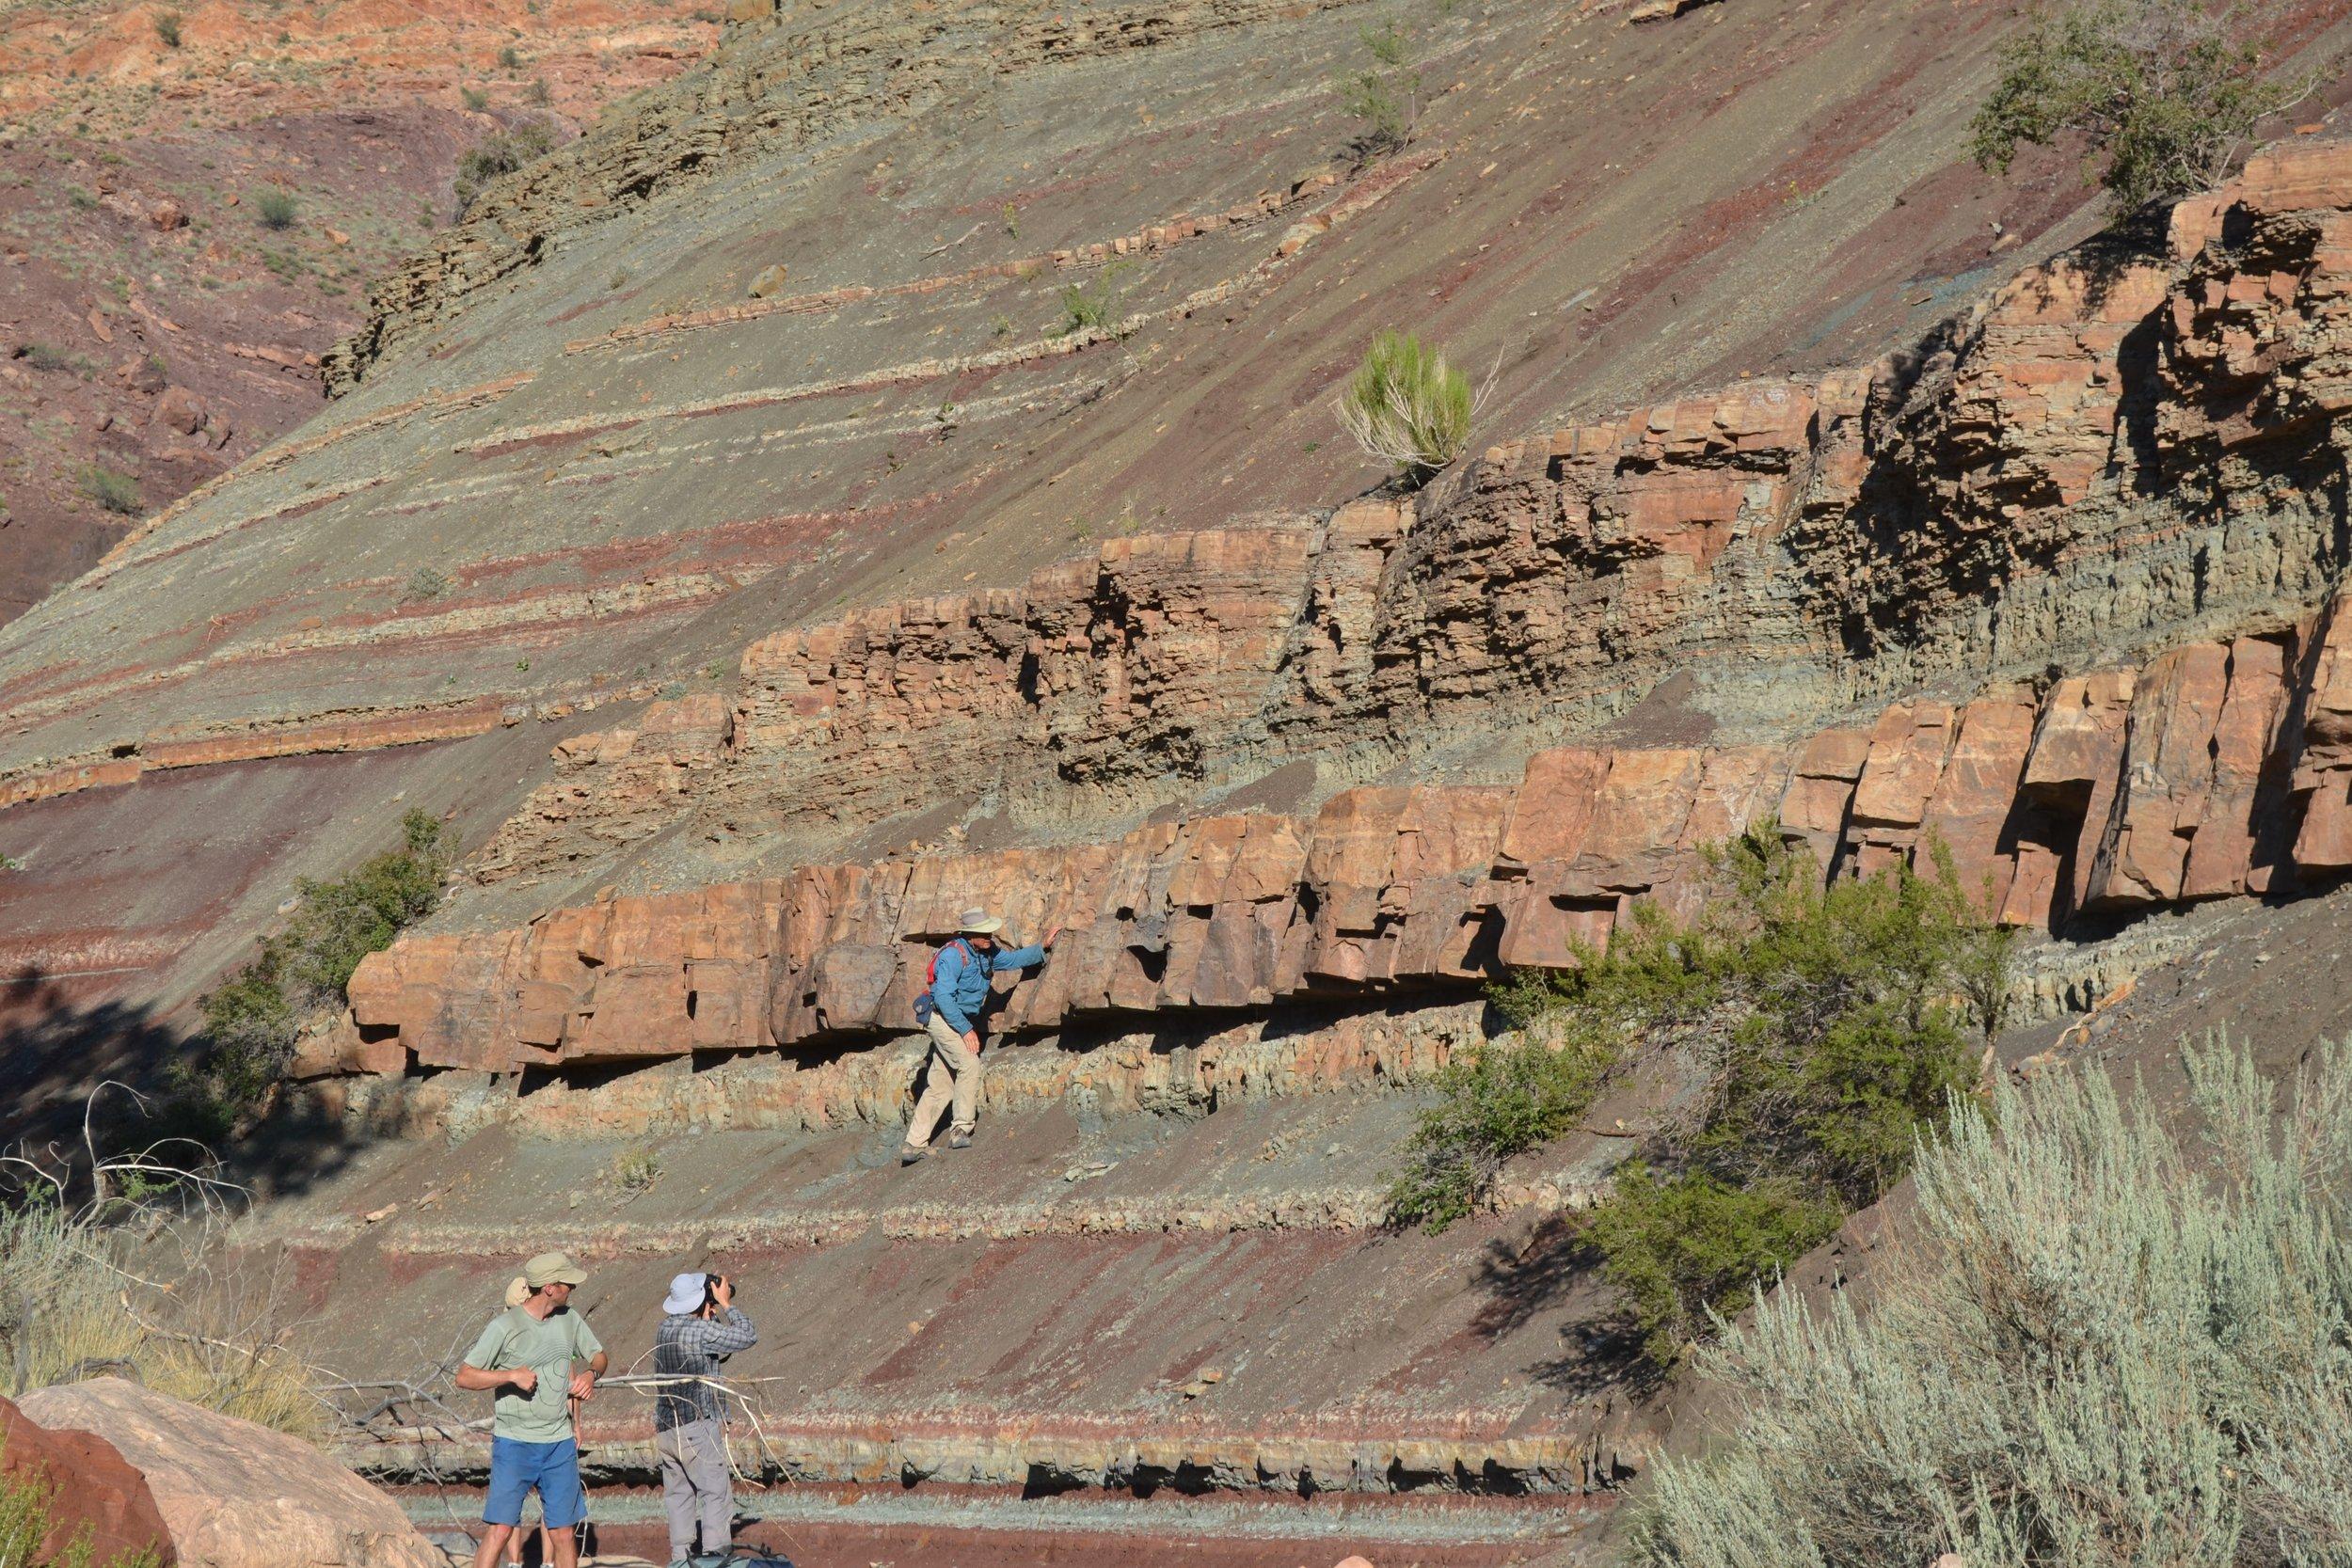 The Tonian Chuar Group in the Grand Canyon, AZ.